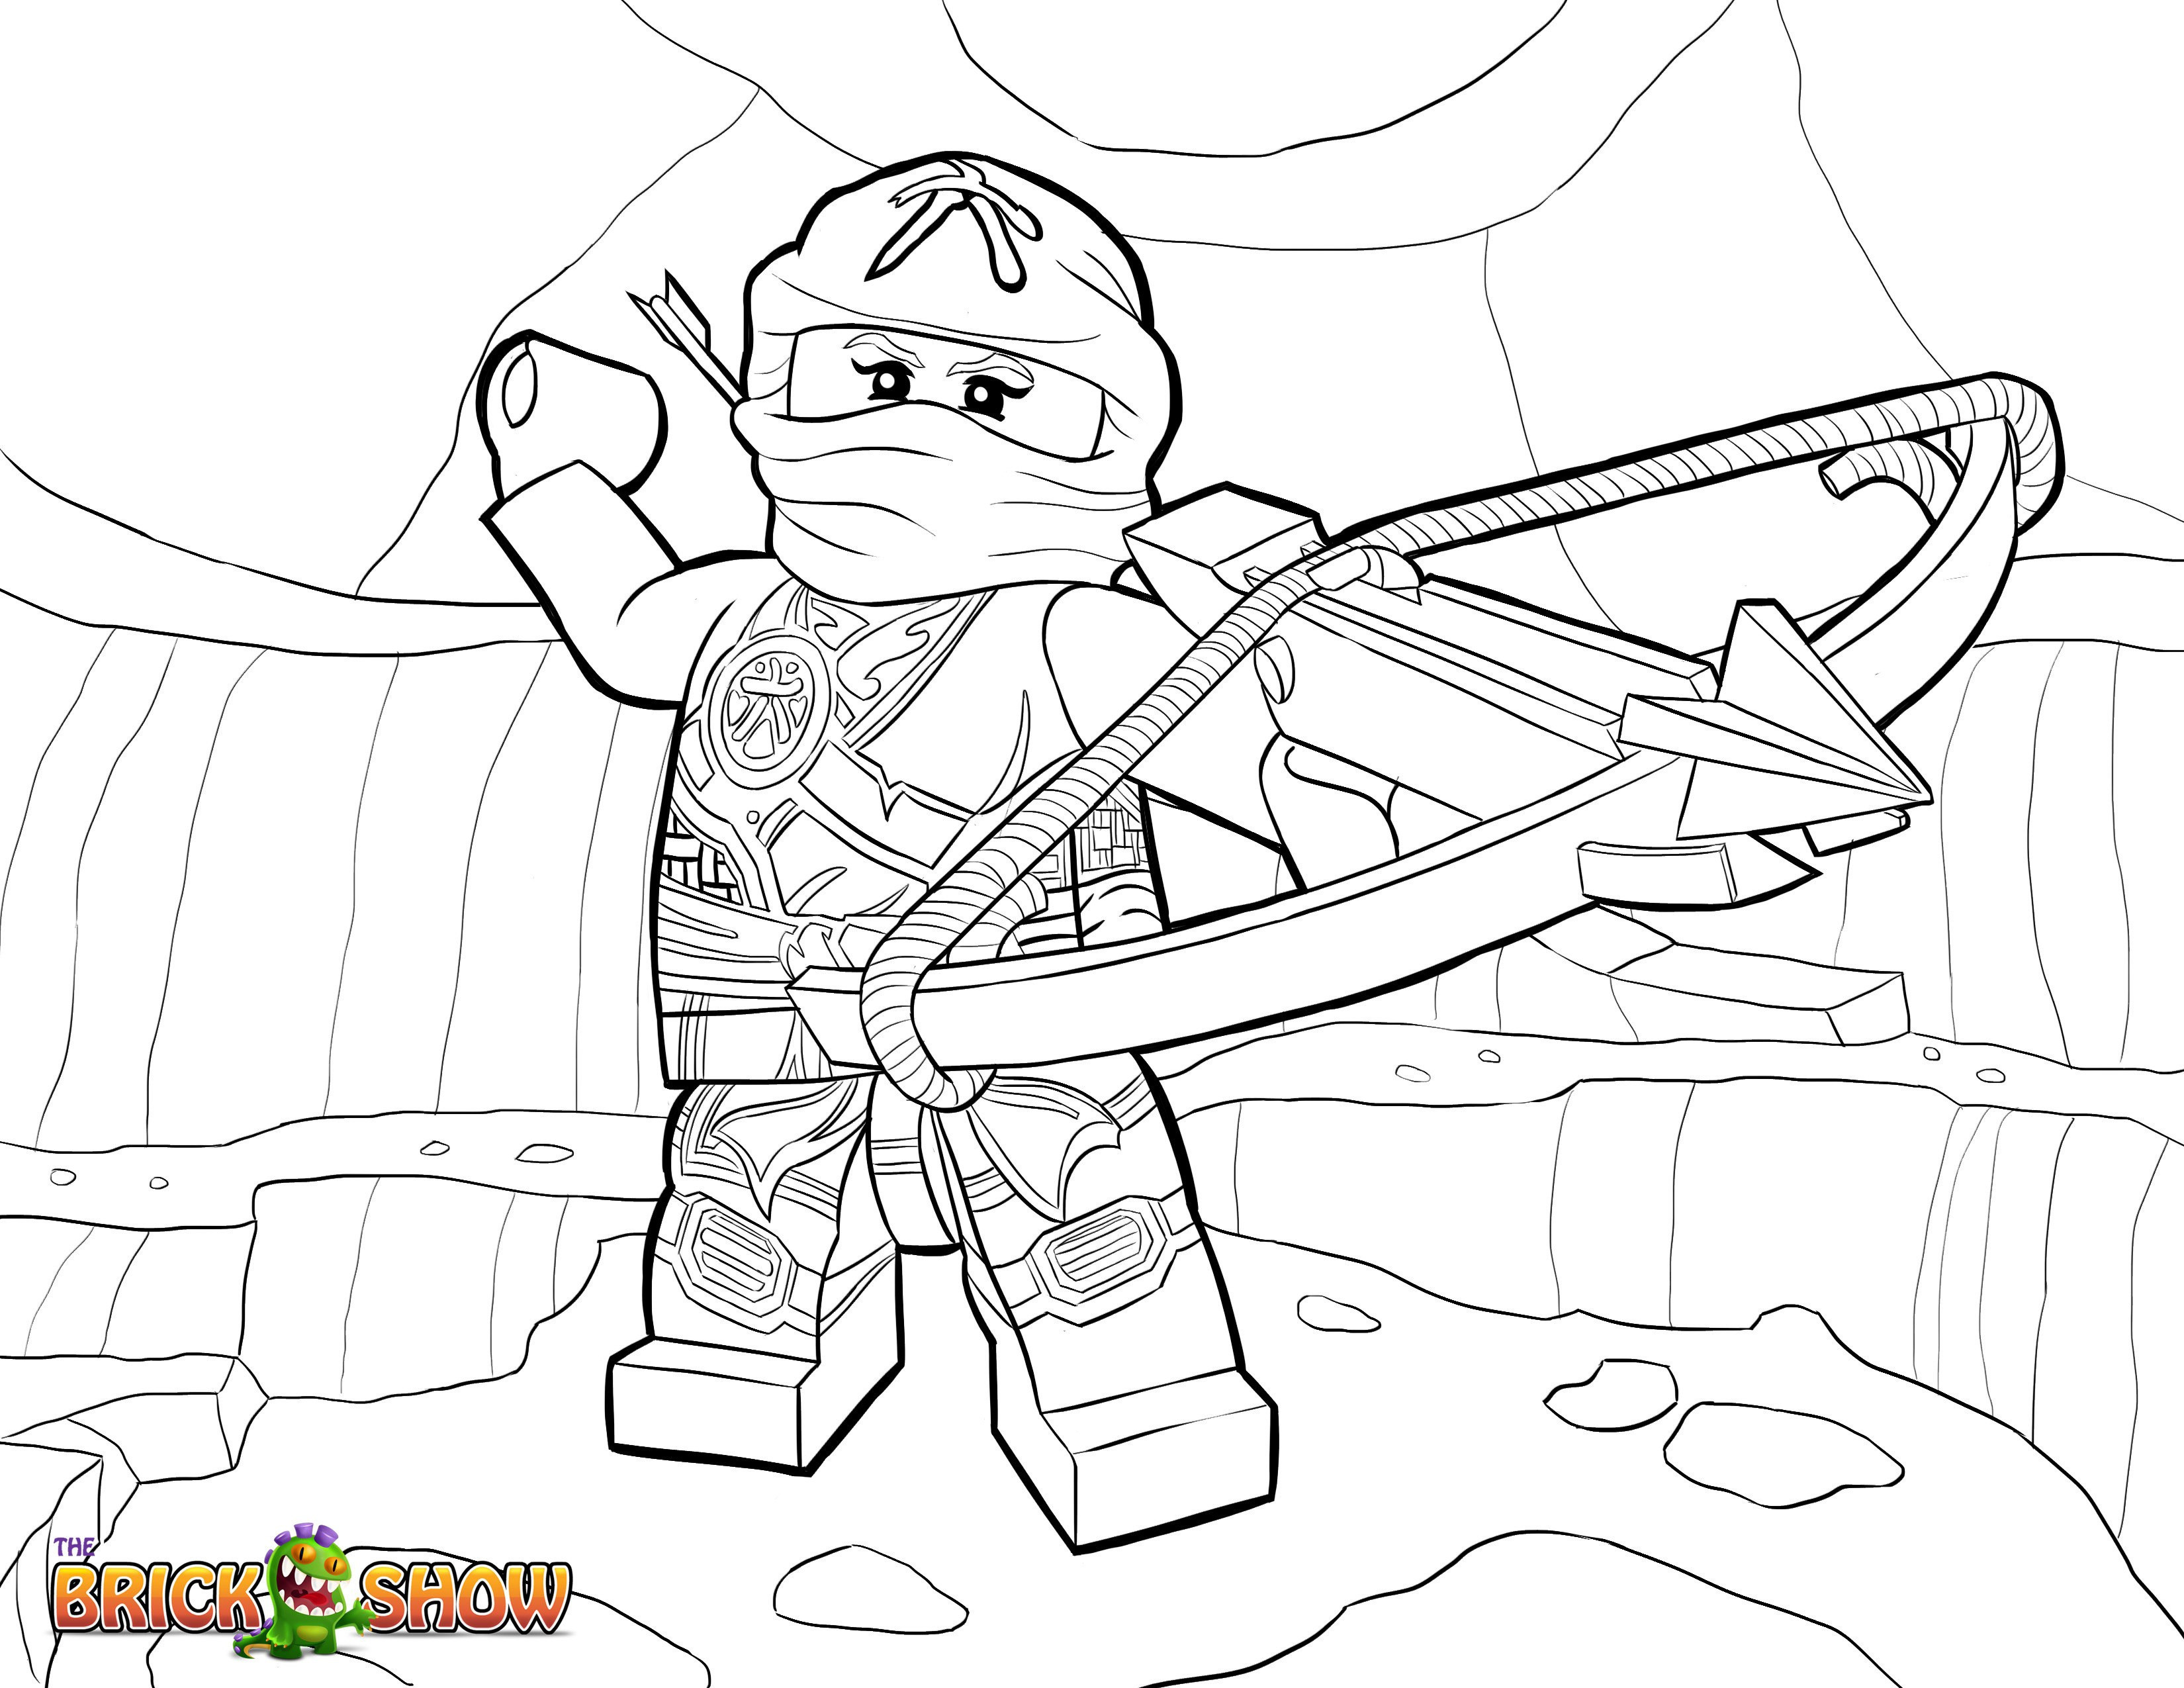 Ausmalbild Lego Elves Inspirierend 40 Ninjago Ausmalbilder Zane Scoredatscore Frisch Lego Elves Fotos